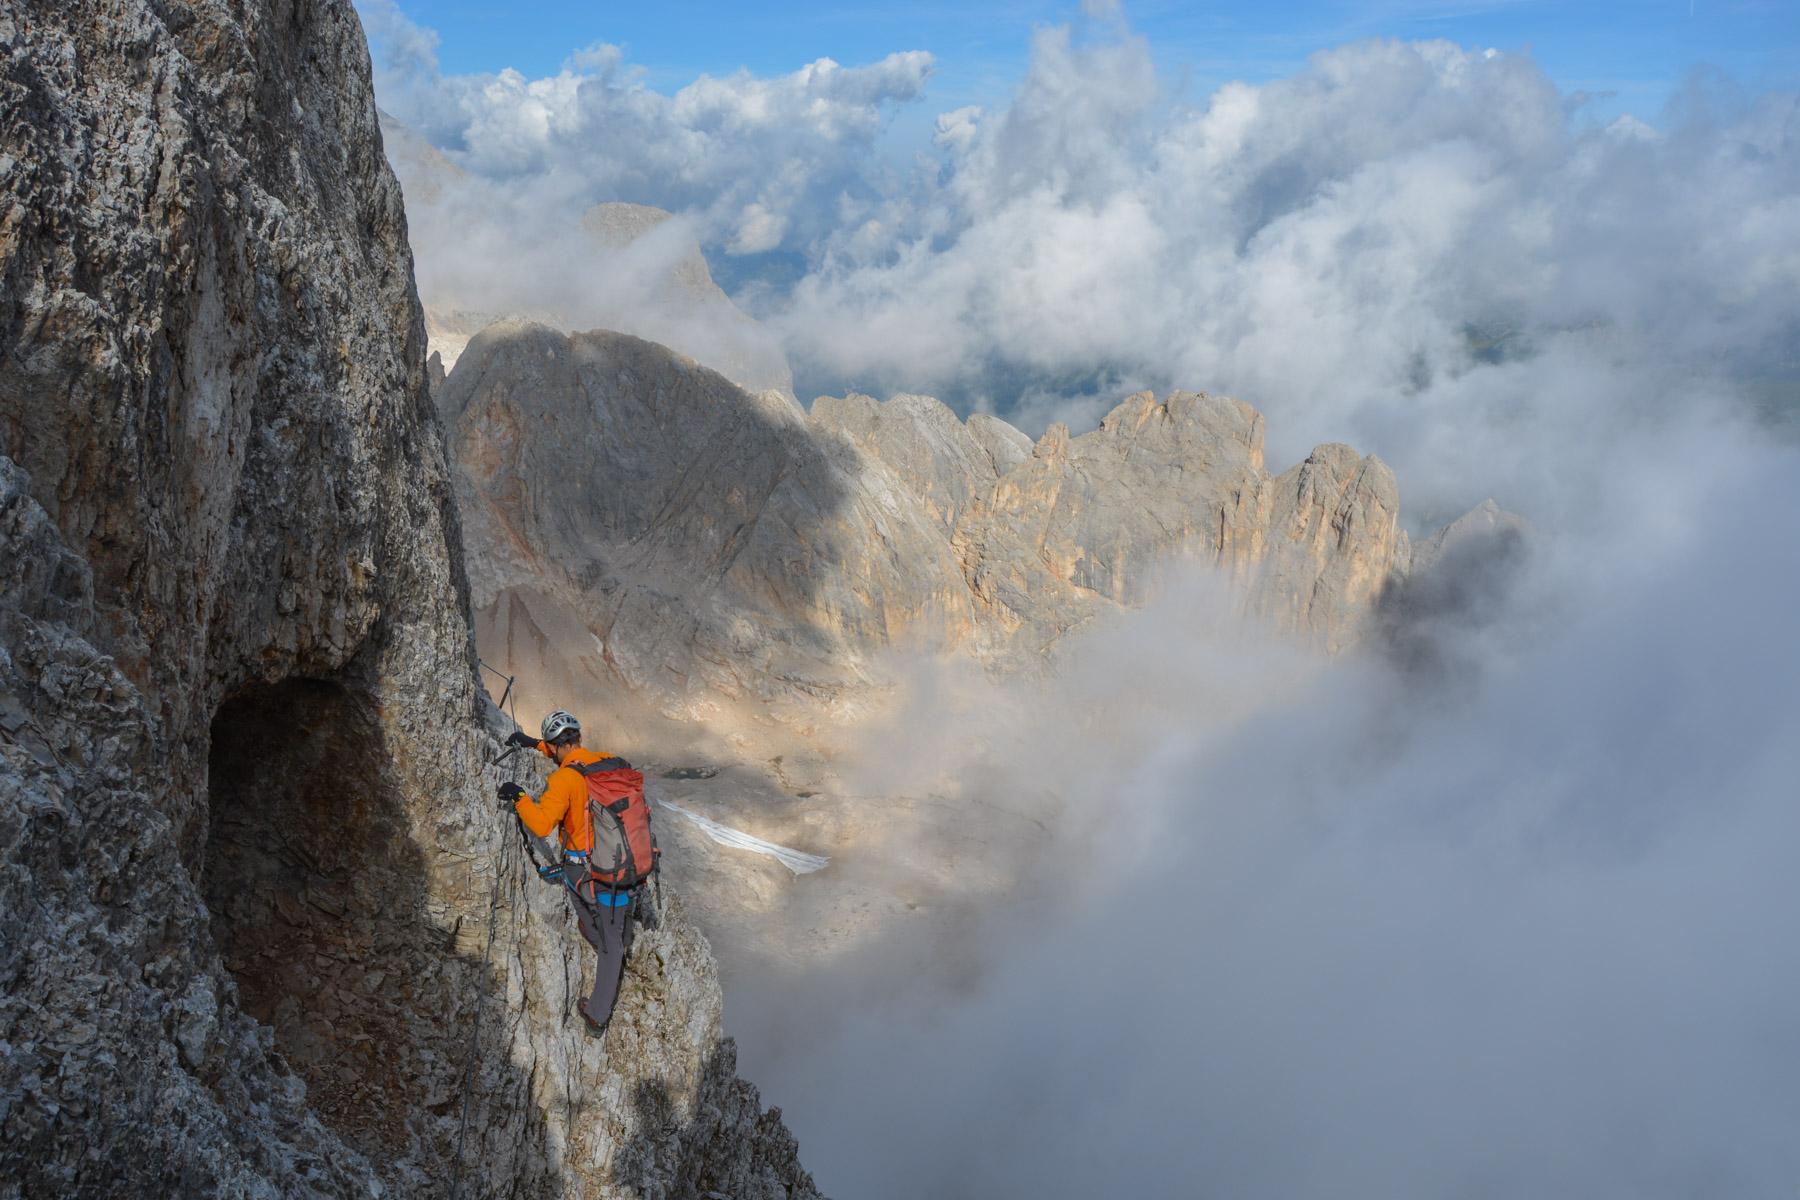 Via Eterna Brigata Cadore, Dolomites 2